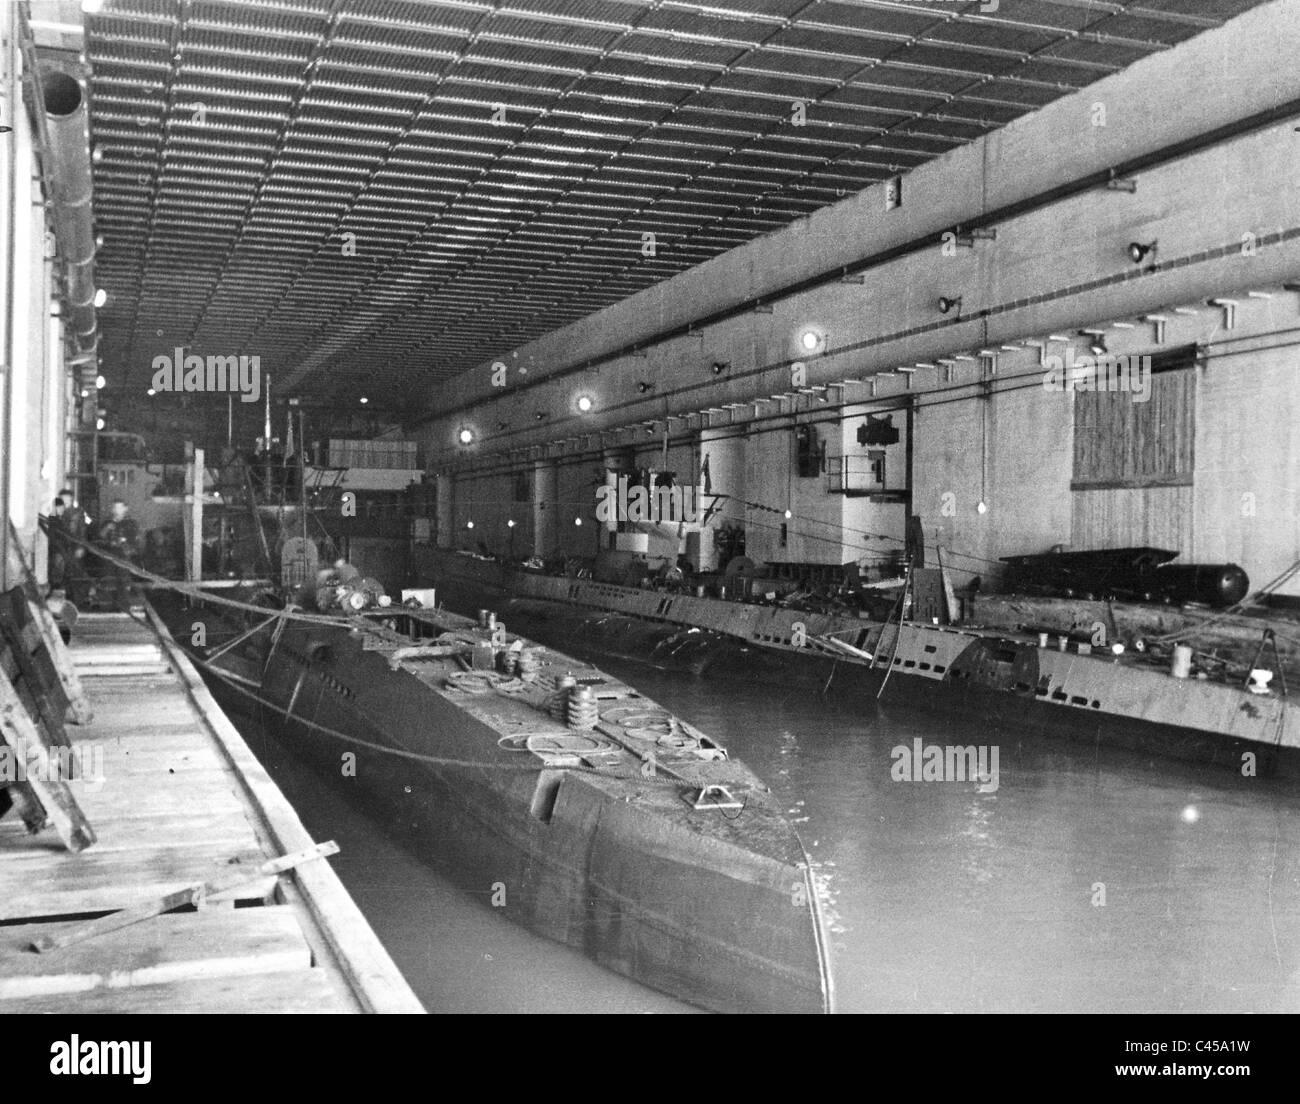 hight resolution of german u boats in a u boat bunker in france 1943 stock